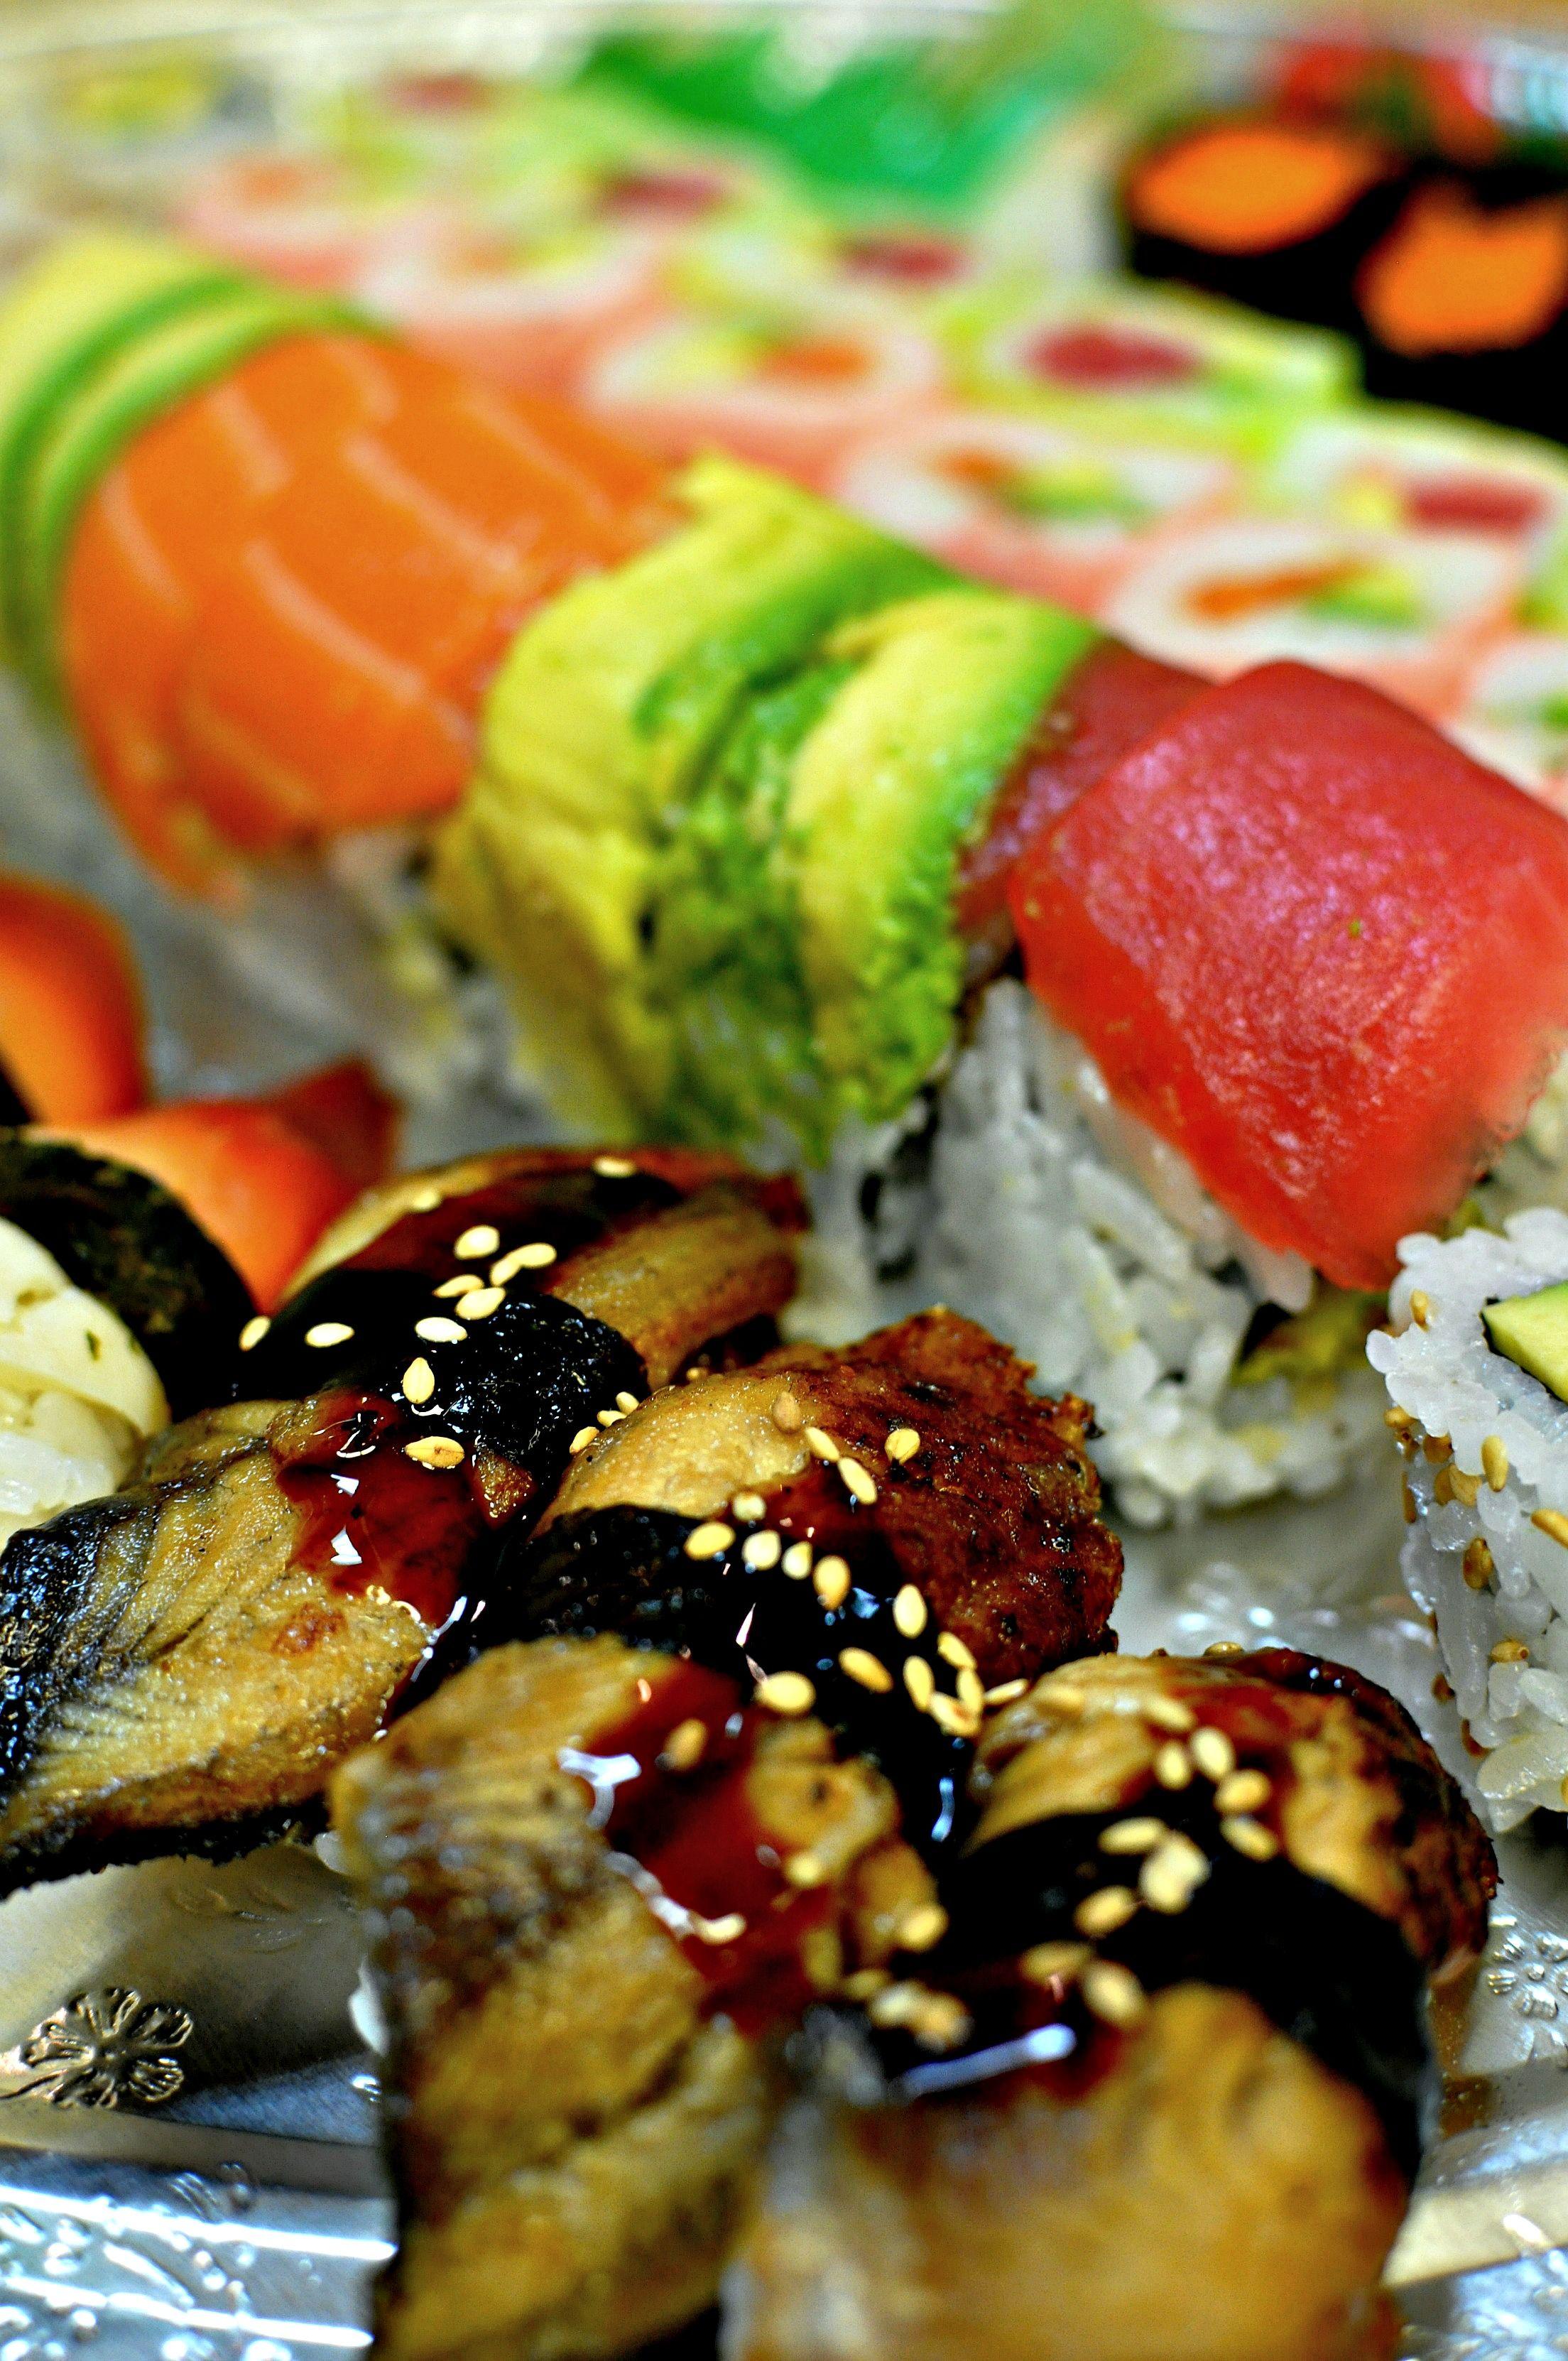 Tensuke Market Chicago catering sushi platter www